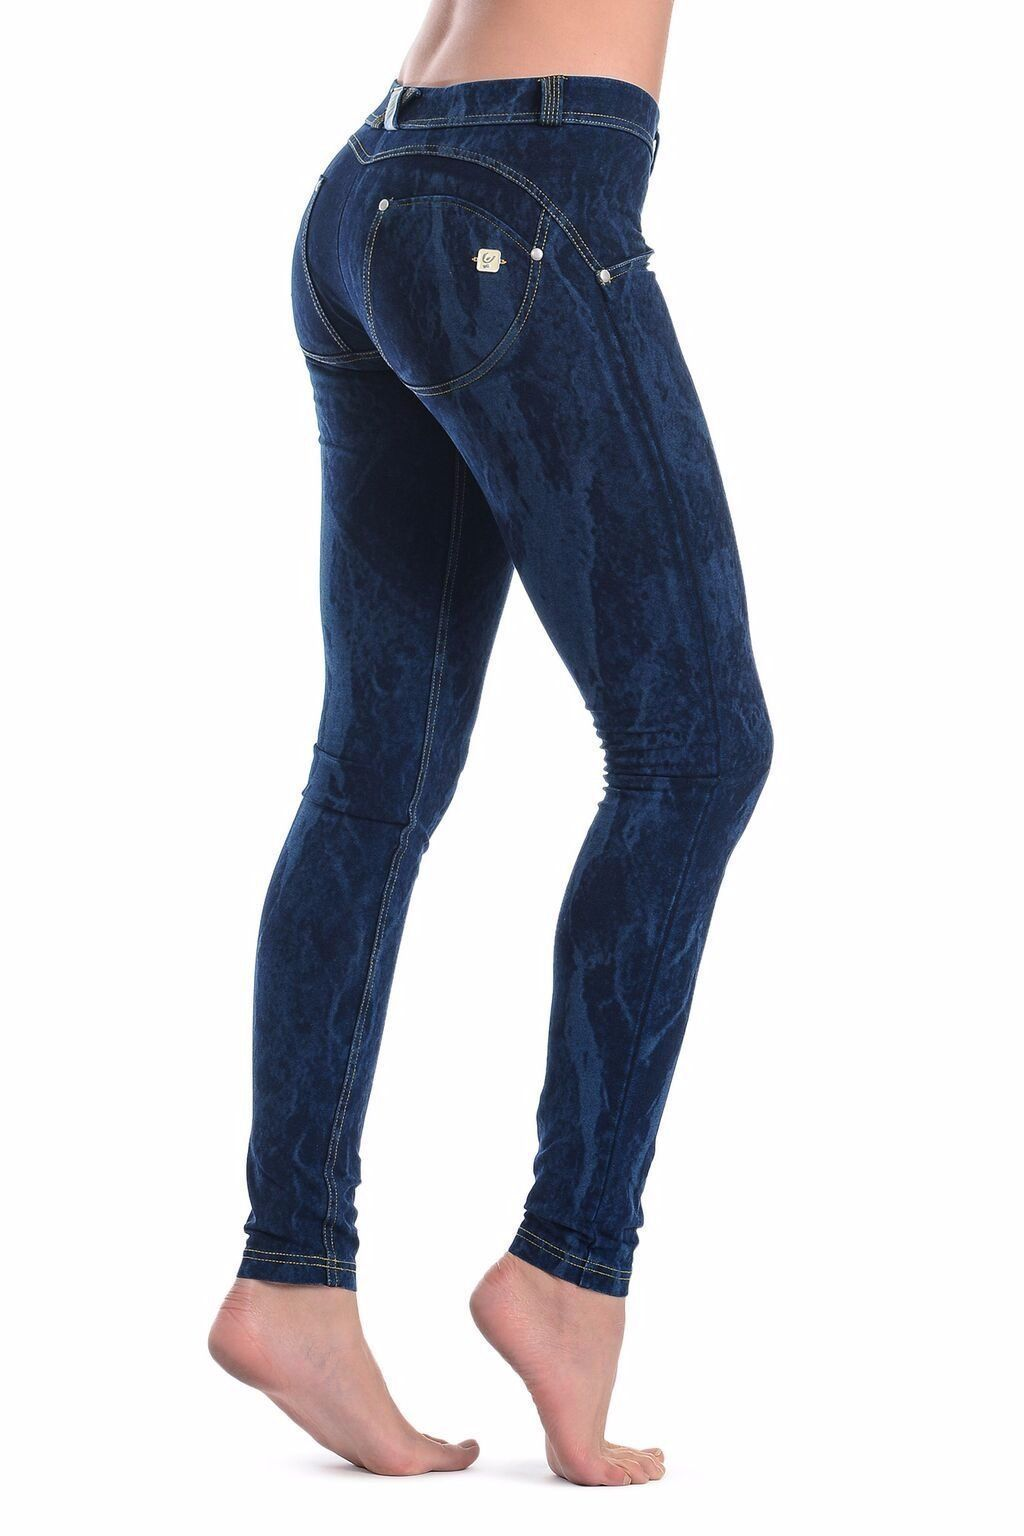 WR.UP® Shaping Jeans Skinny Low Dye Bleed Dark Blue